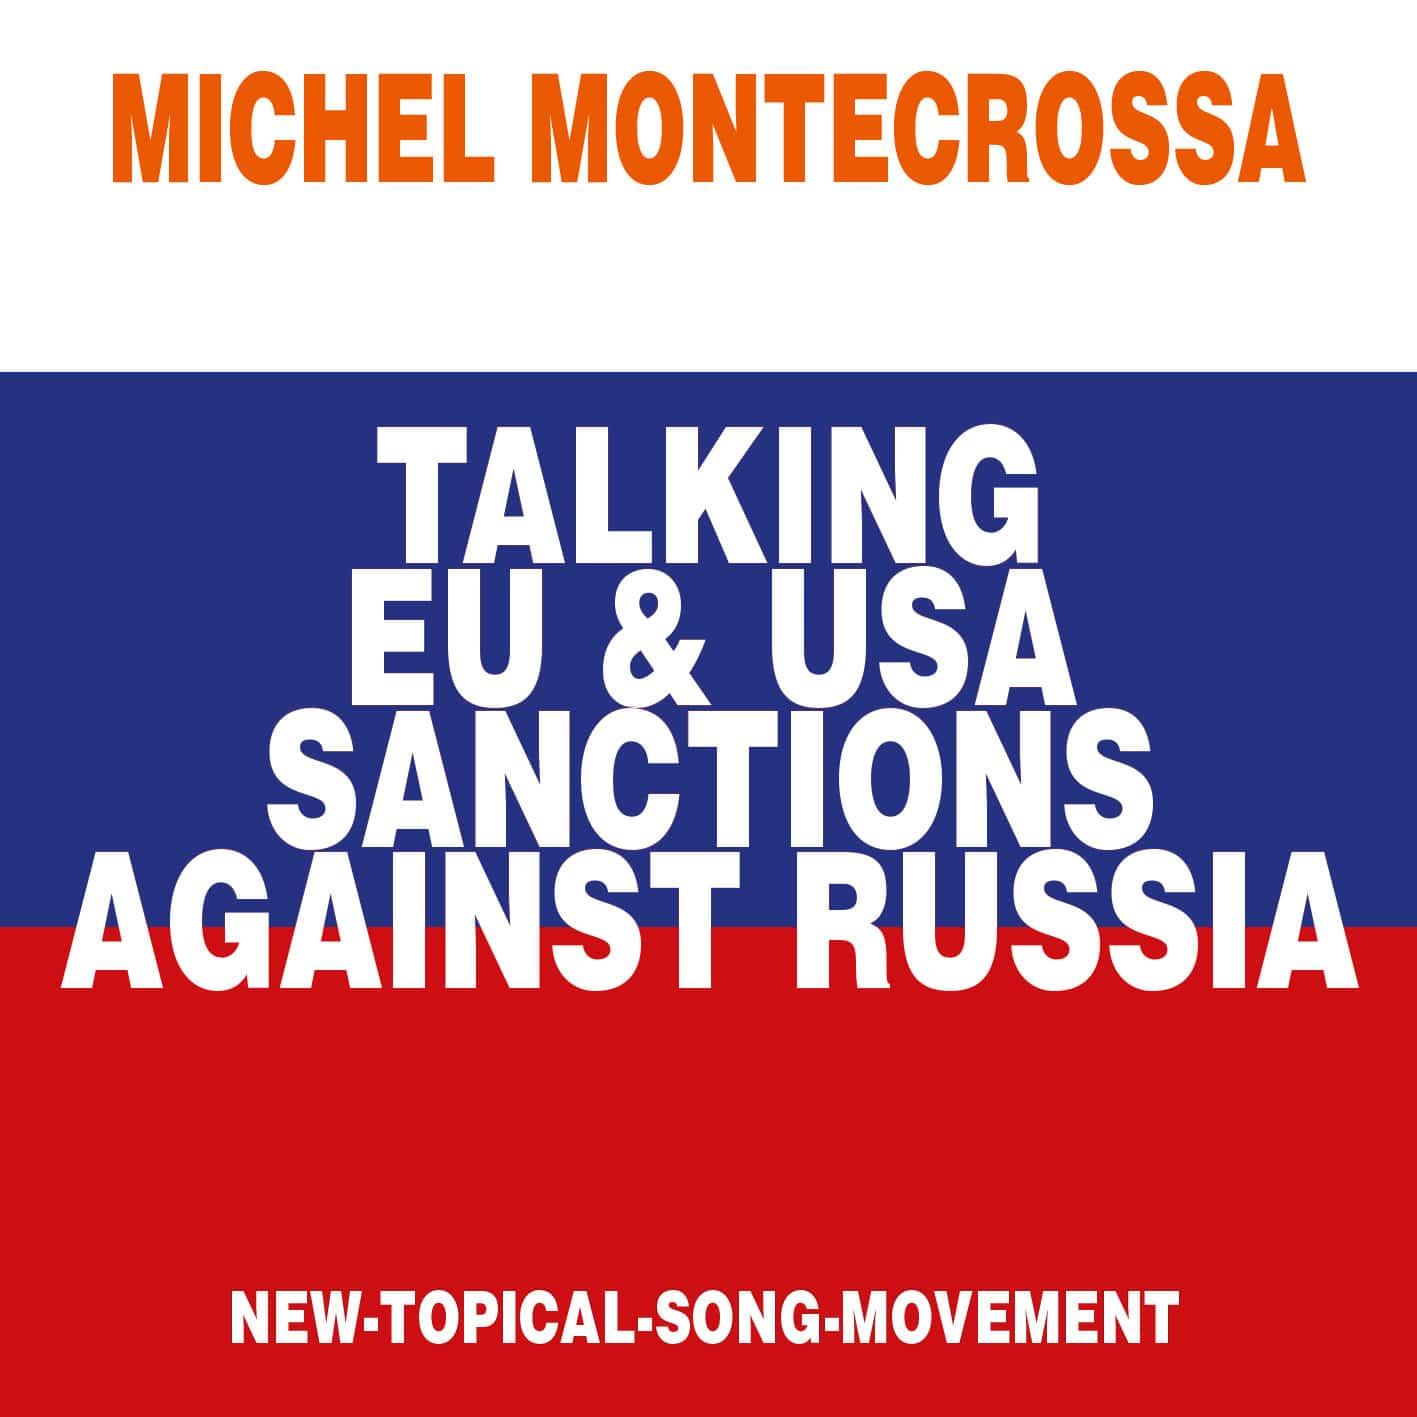 Talking EU & USA Sanktions Against Russia